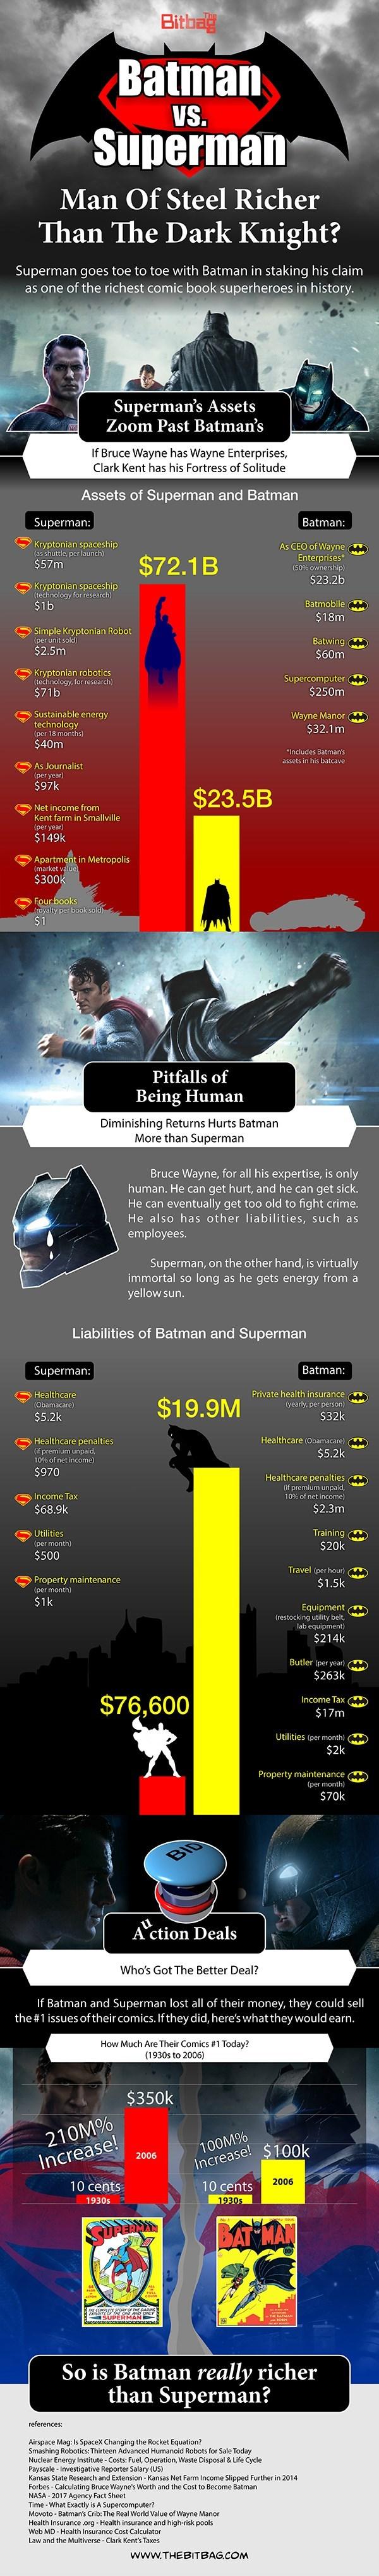 infographic batman superman money Apparently Superman Has More Money Than Batman?